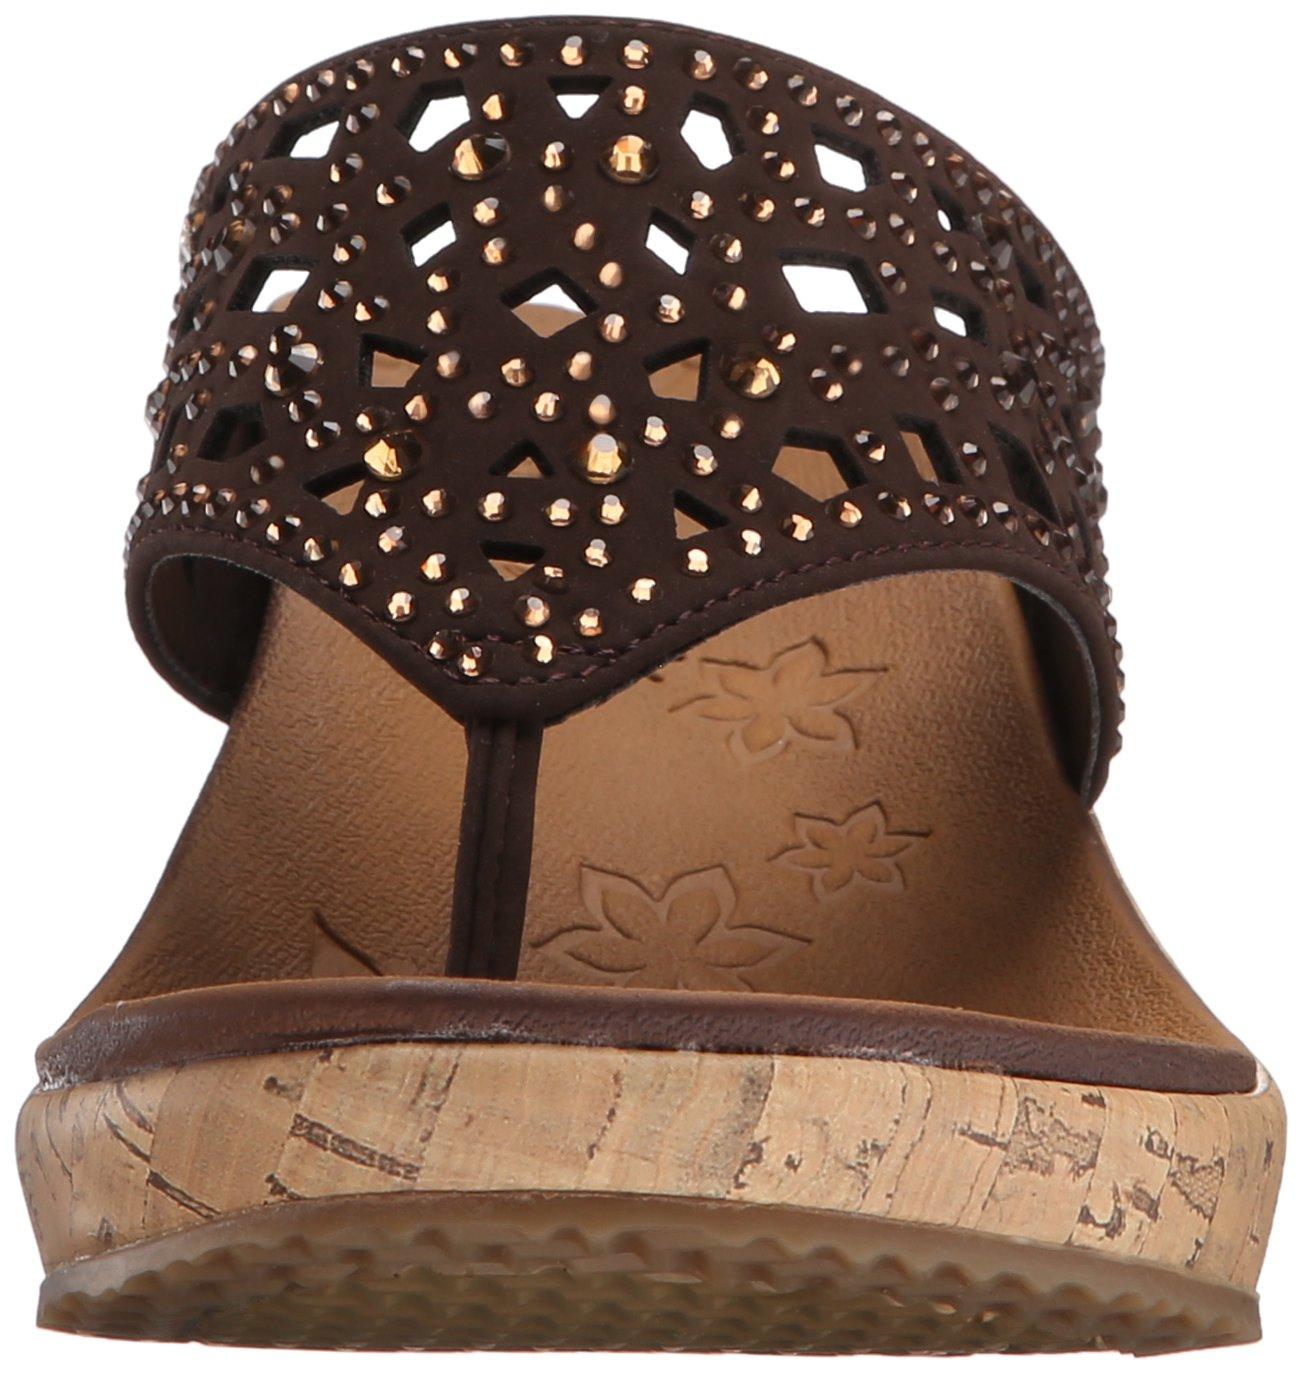 827c4acfa35b Skechers Cali Womens Beverlee Wedge Sandal Christmas gift store